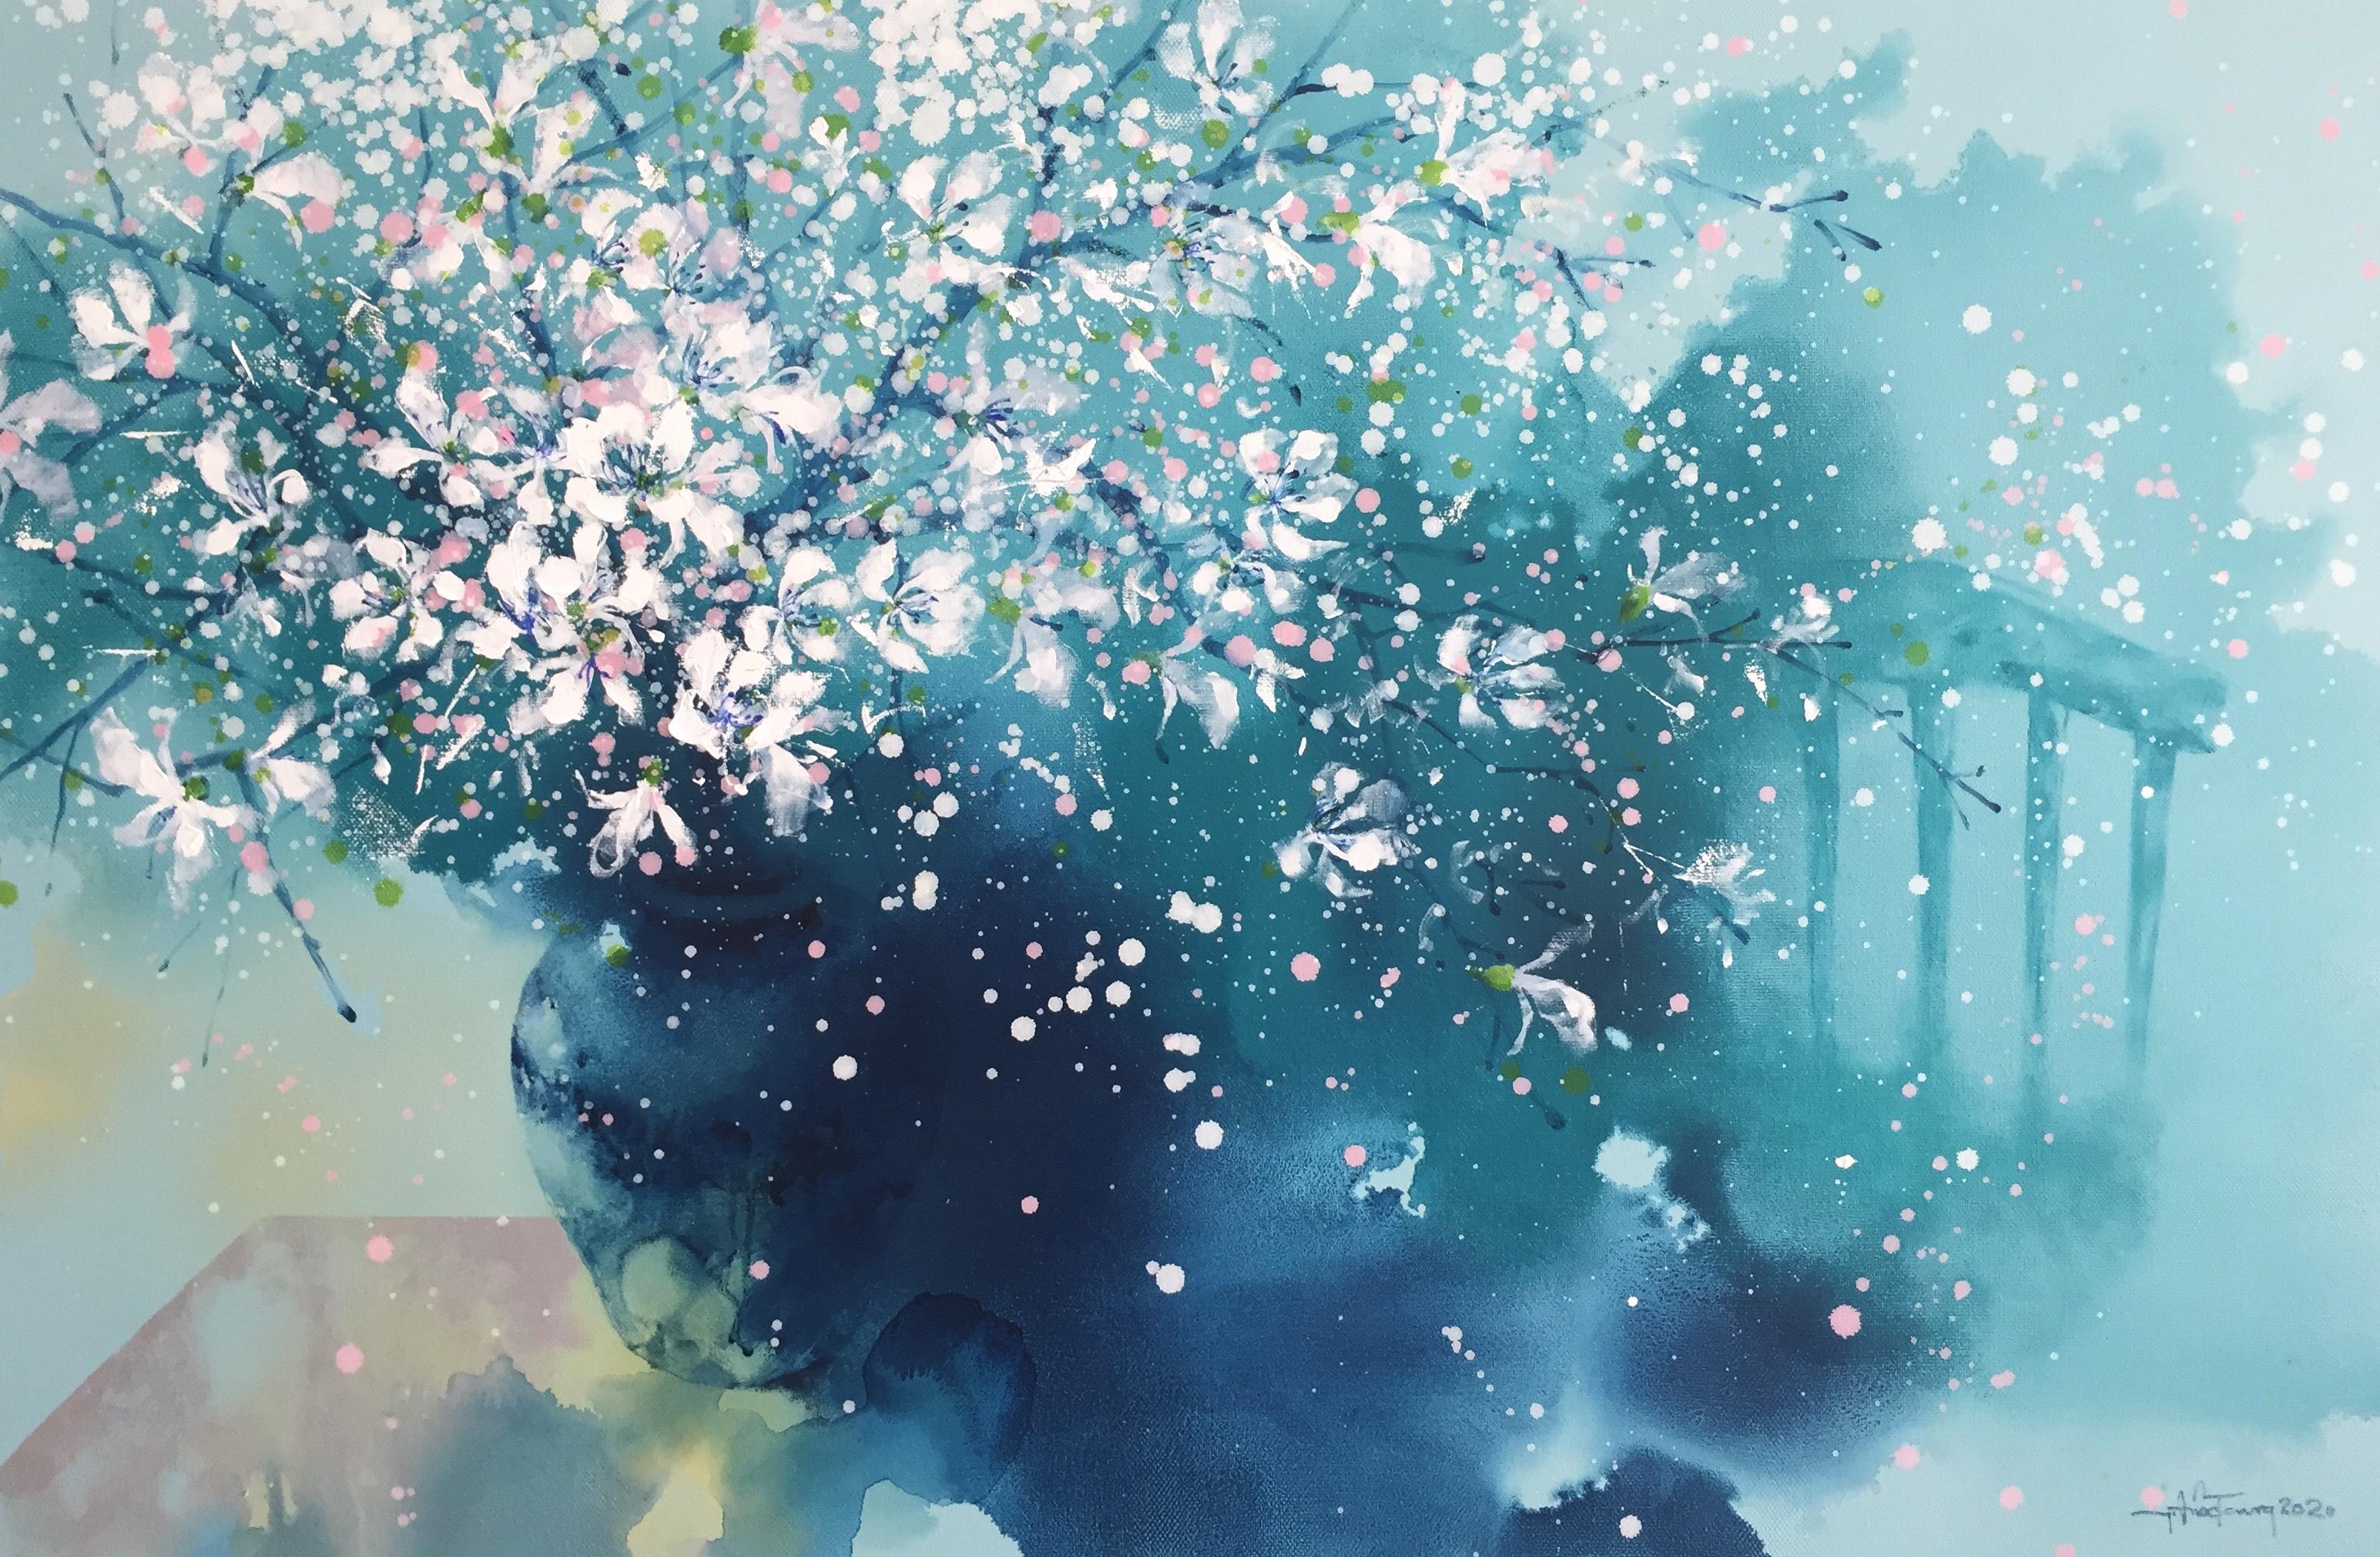 Ban Flowers In Blue Space | Hoa Ban Trong Không Gian Xanh